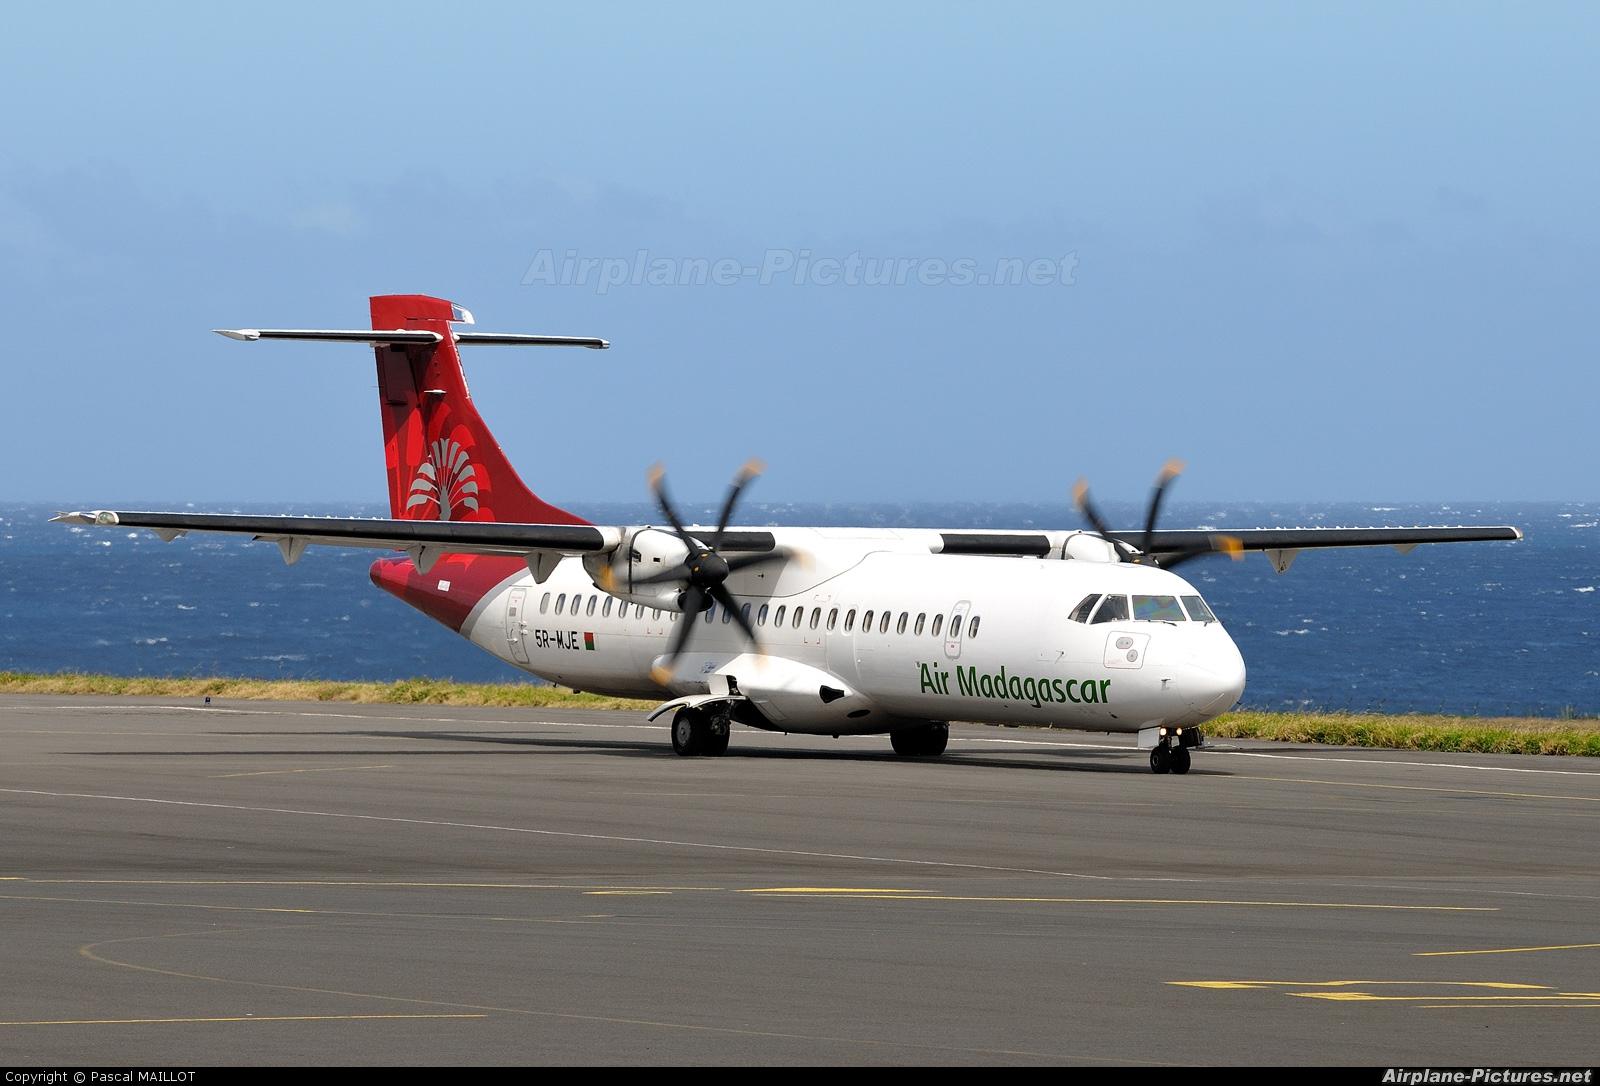 Air Madagascar 5R-MJE aircraft at Saint-Pierre - Pierrefonds